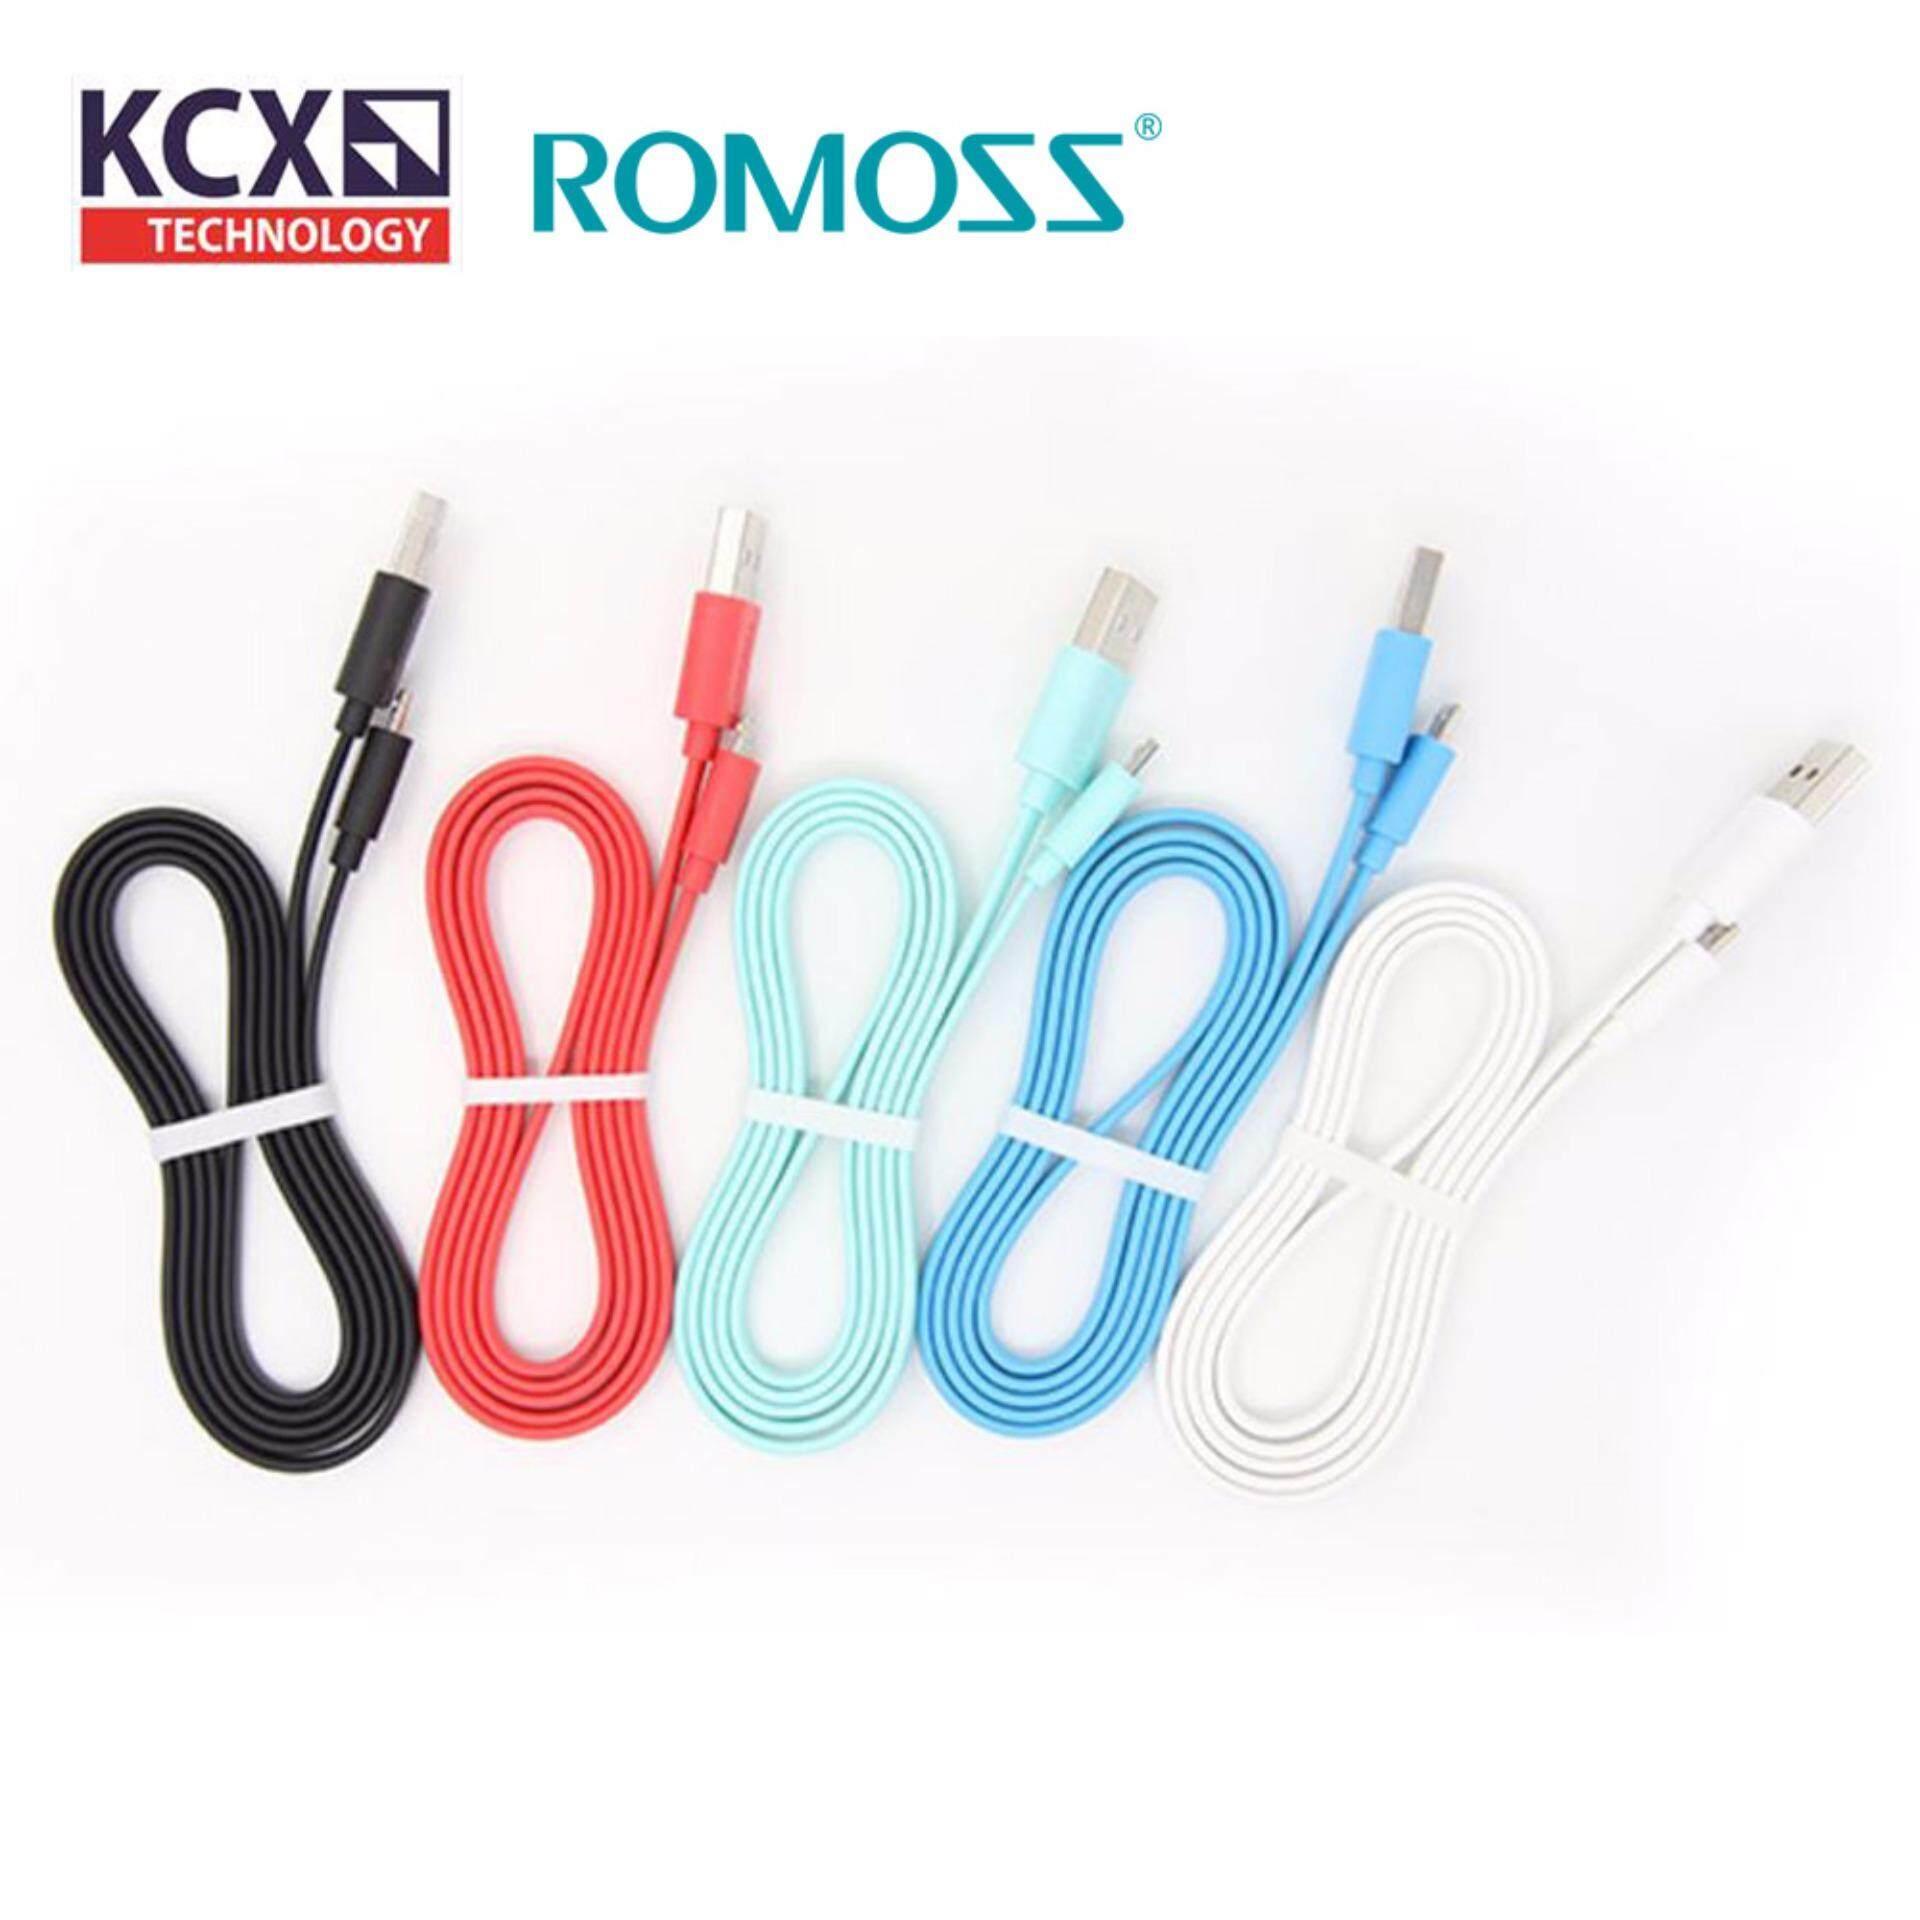 Kcx Technology New Arrival Flashdisk 16gb Toshiba Packing Hijau Romoss Premium Micro Usb Cable 1 Meter